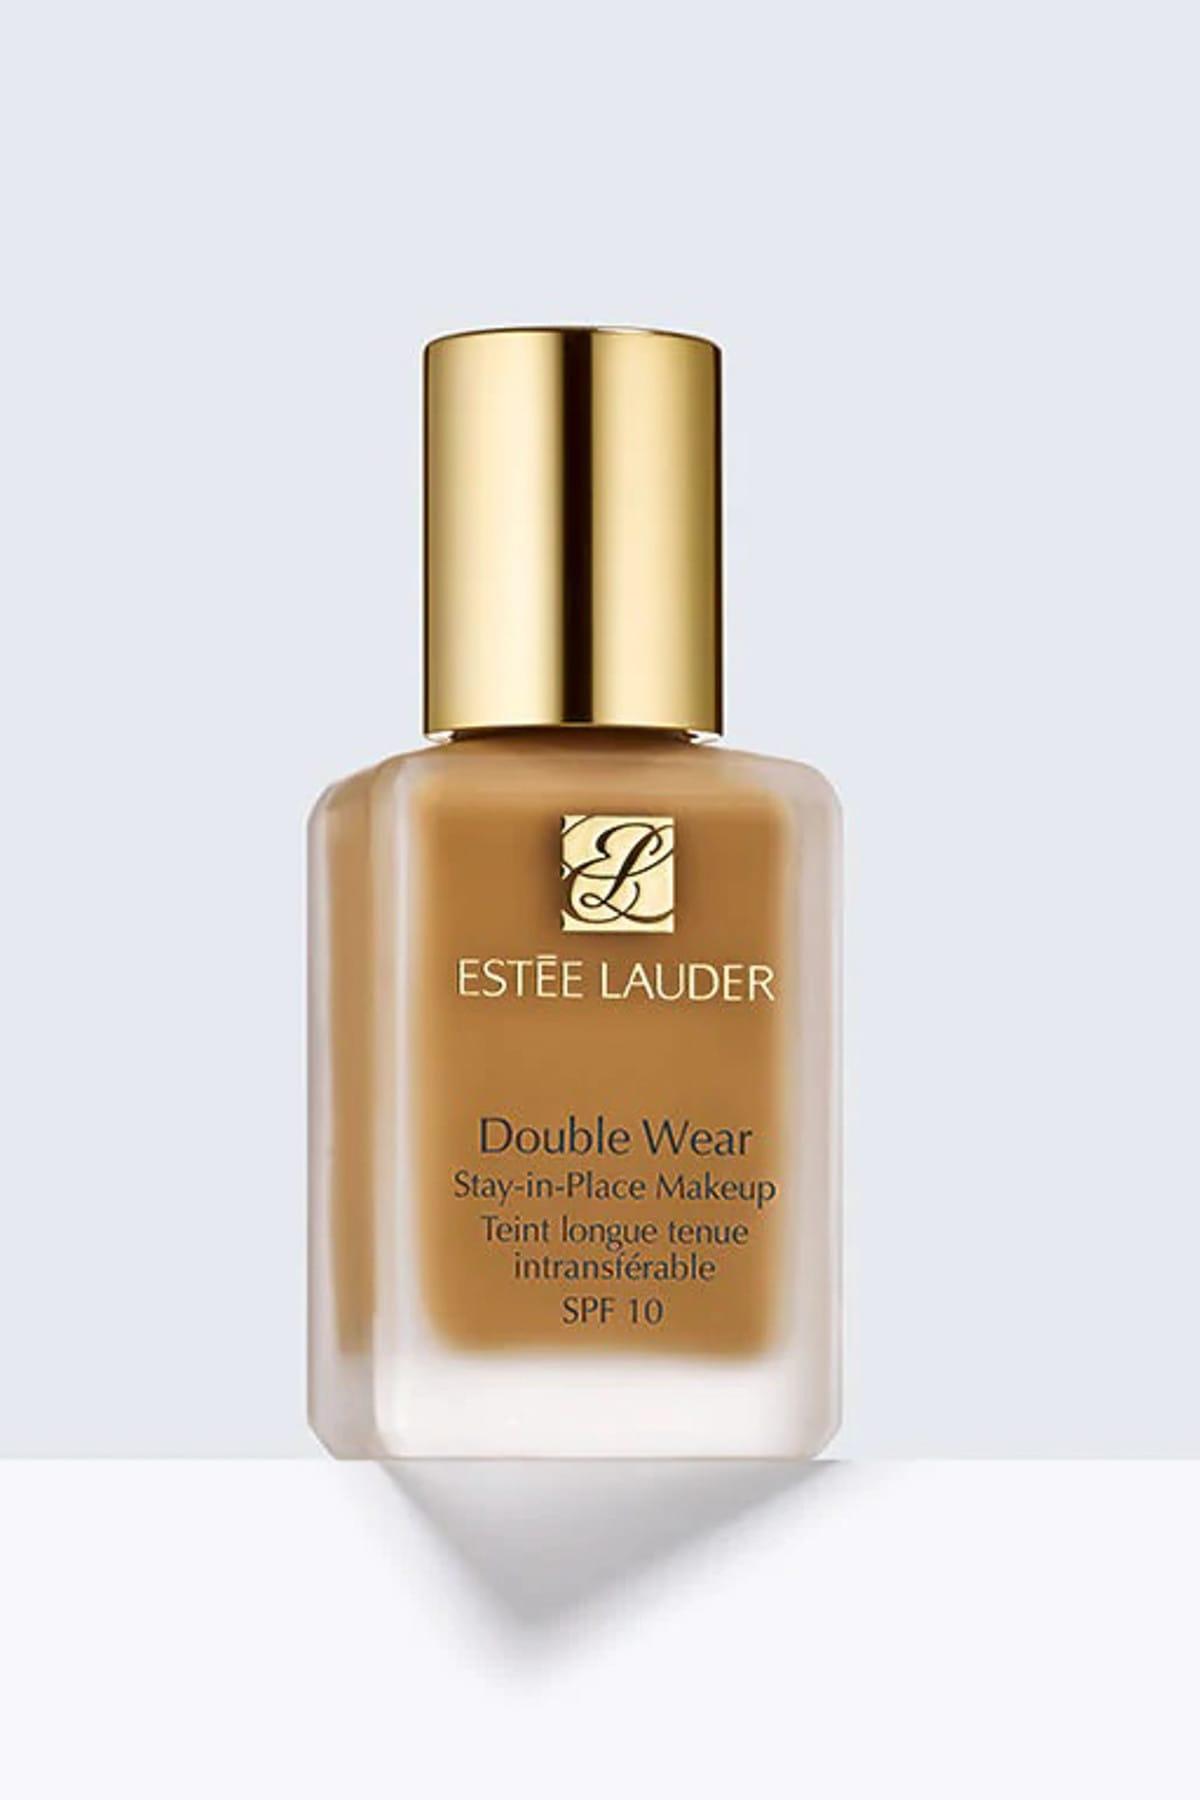 Estee Lauder Fondöten - Double Wear Foundation S.I.P Spf10 5W1 Bronze 30 ml027131392439 1